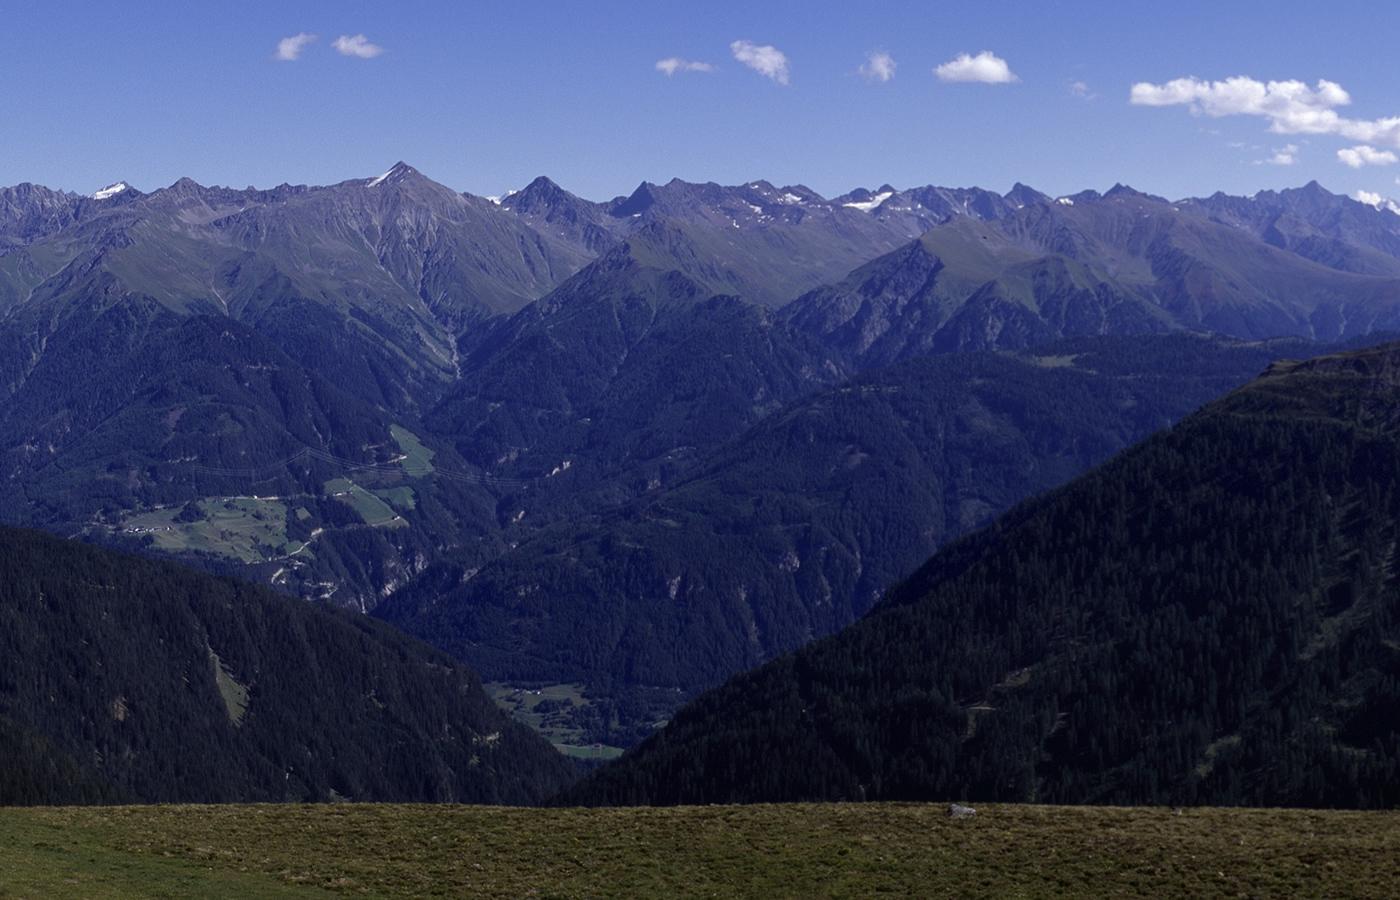 Bergkette in Serfaus-Fiss-Ladis. Wetterinfos.